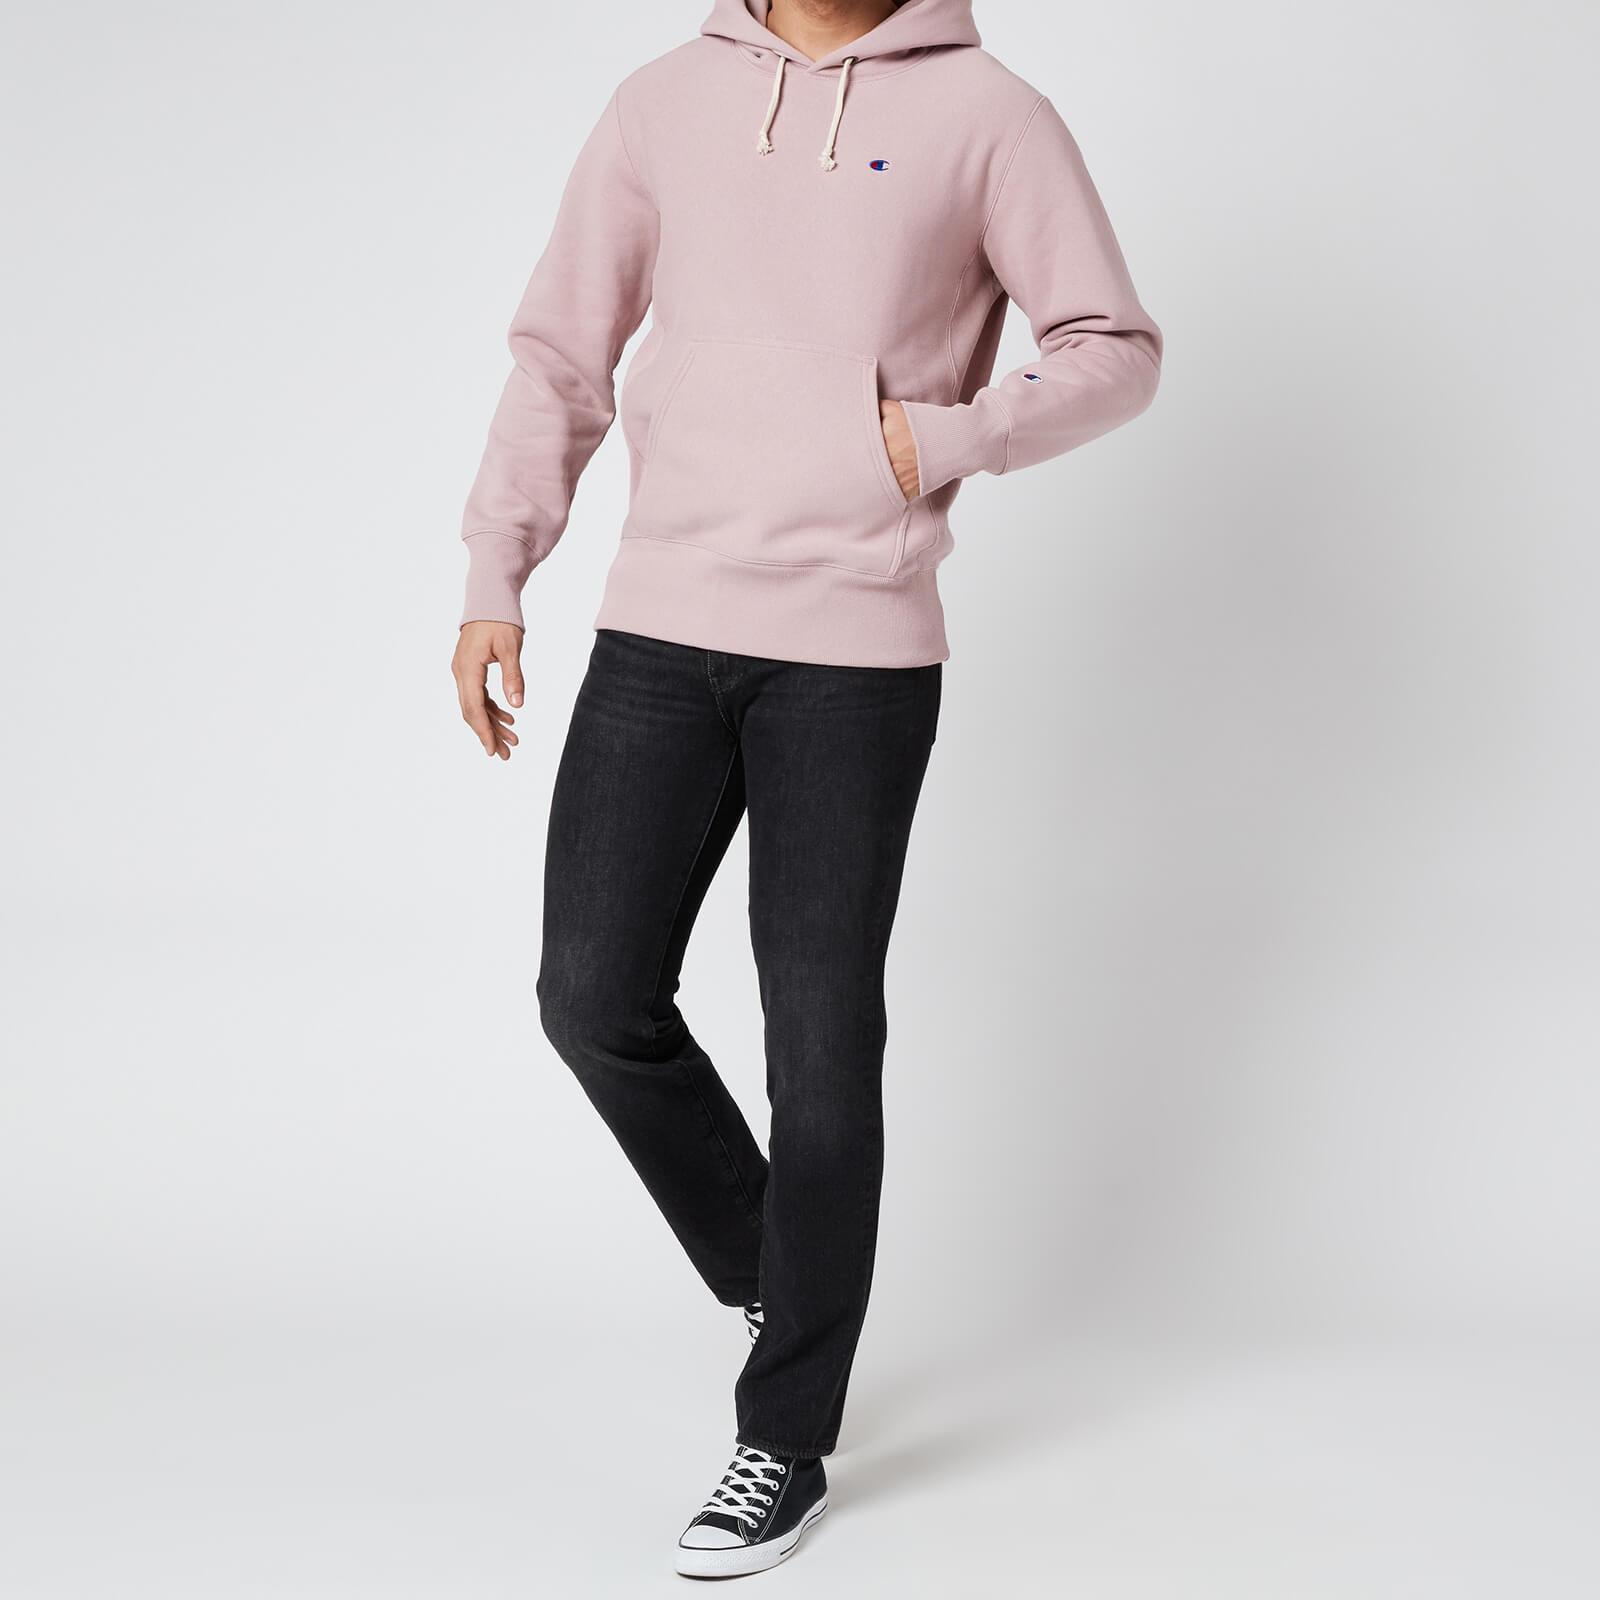 Champion Men's Reverse Weave Hoodie - Pink - L